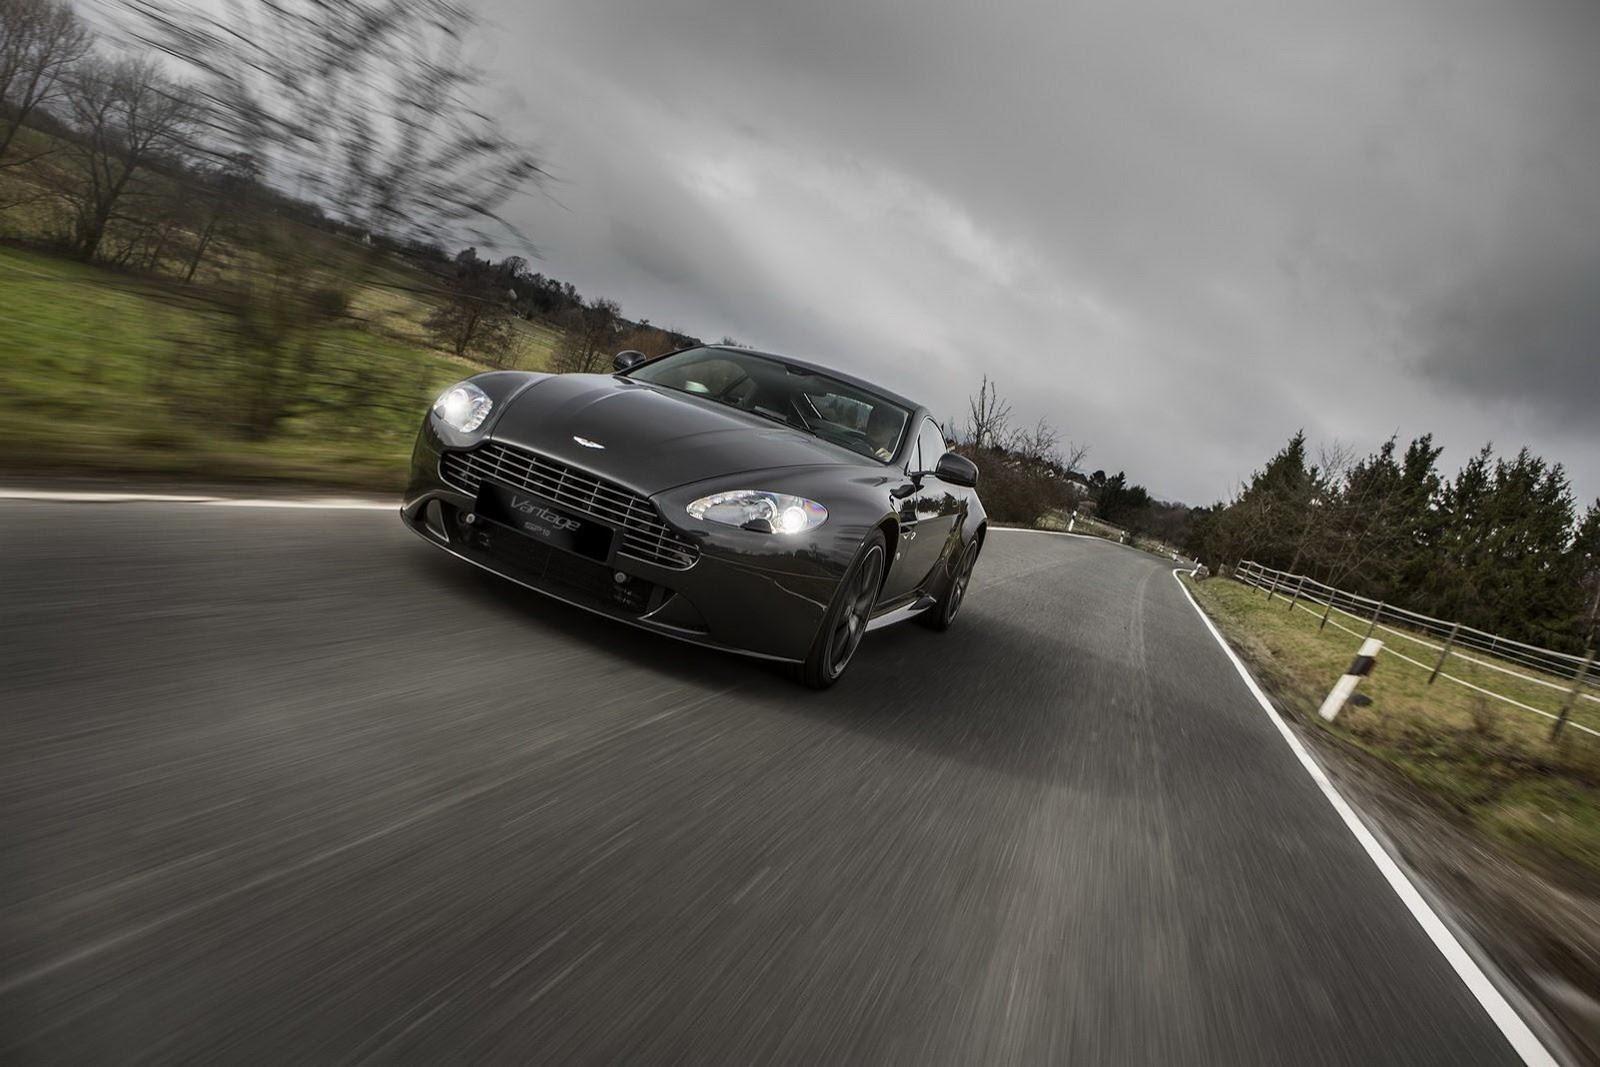 Aston-Martin-SP10-Driving